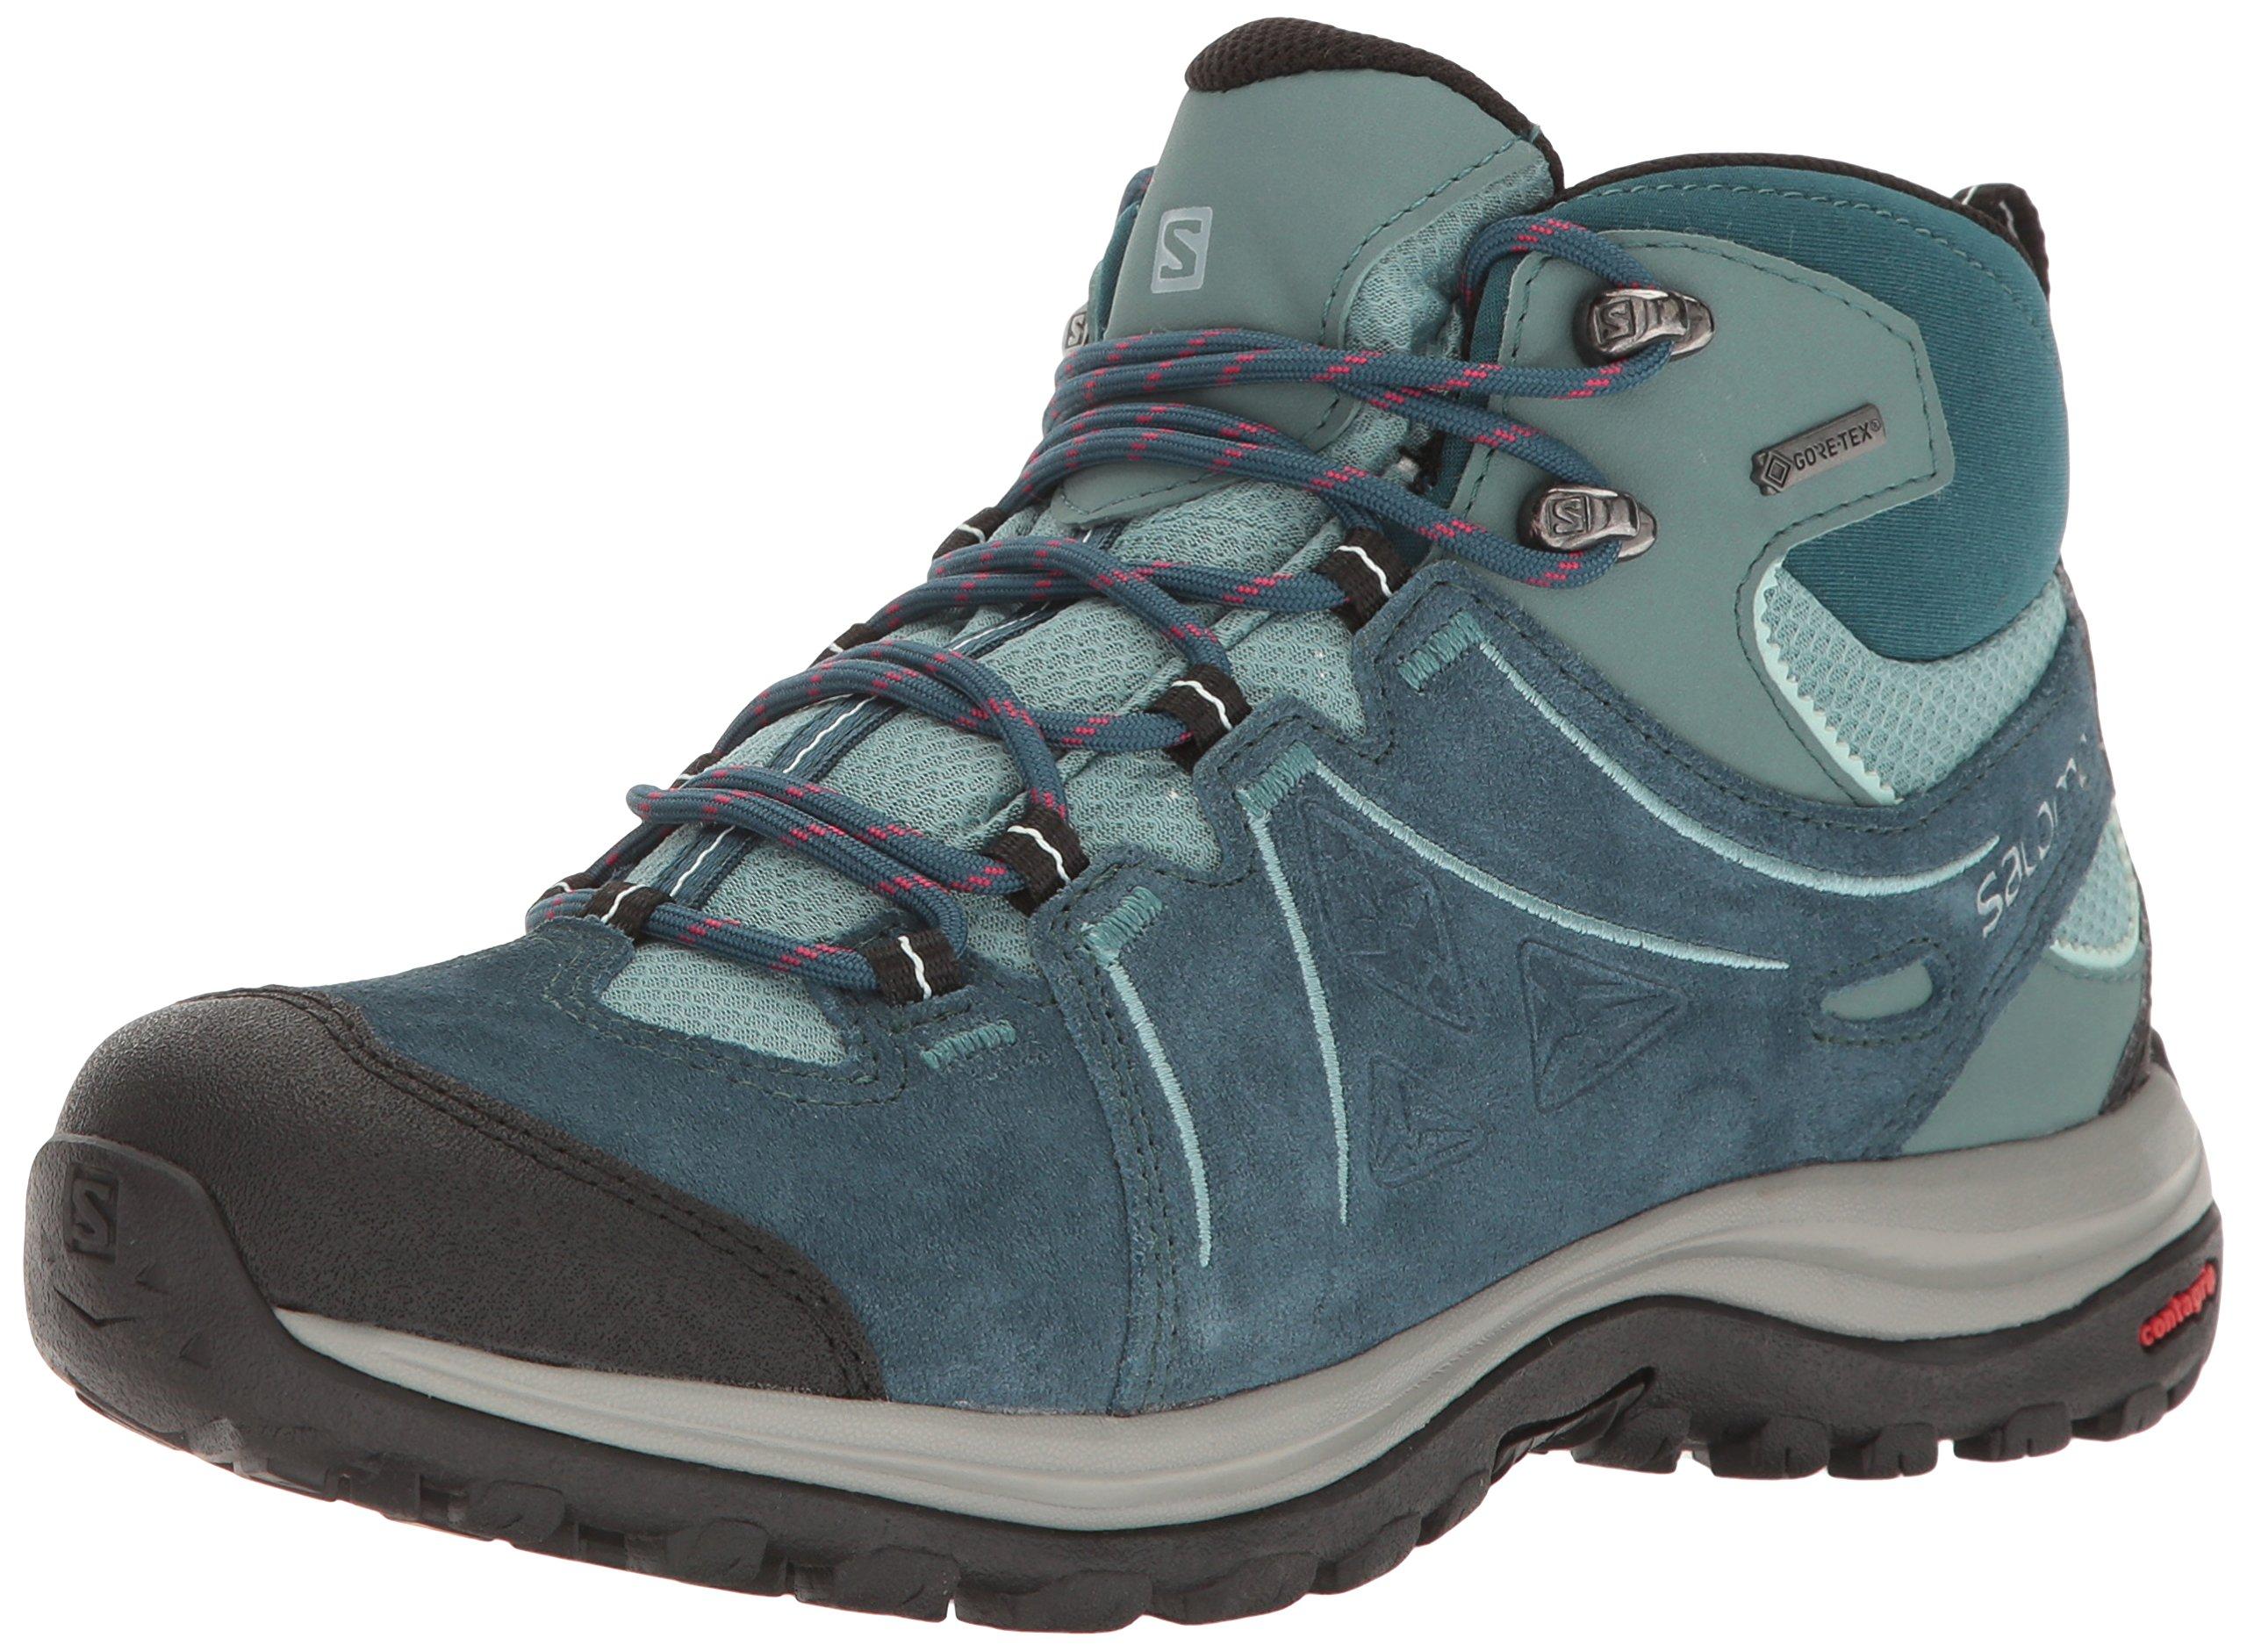 Salomon Women's Ellipse 2 Mid Ltr Gtx W Hiking Boot, Reflecting Pond/Artic/North Atlantic, 8.5 M US